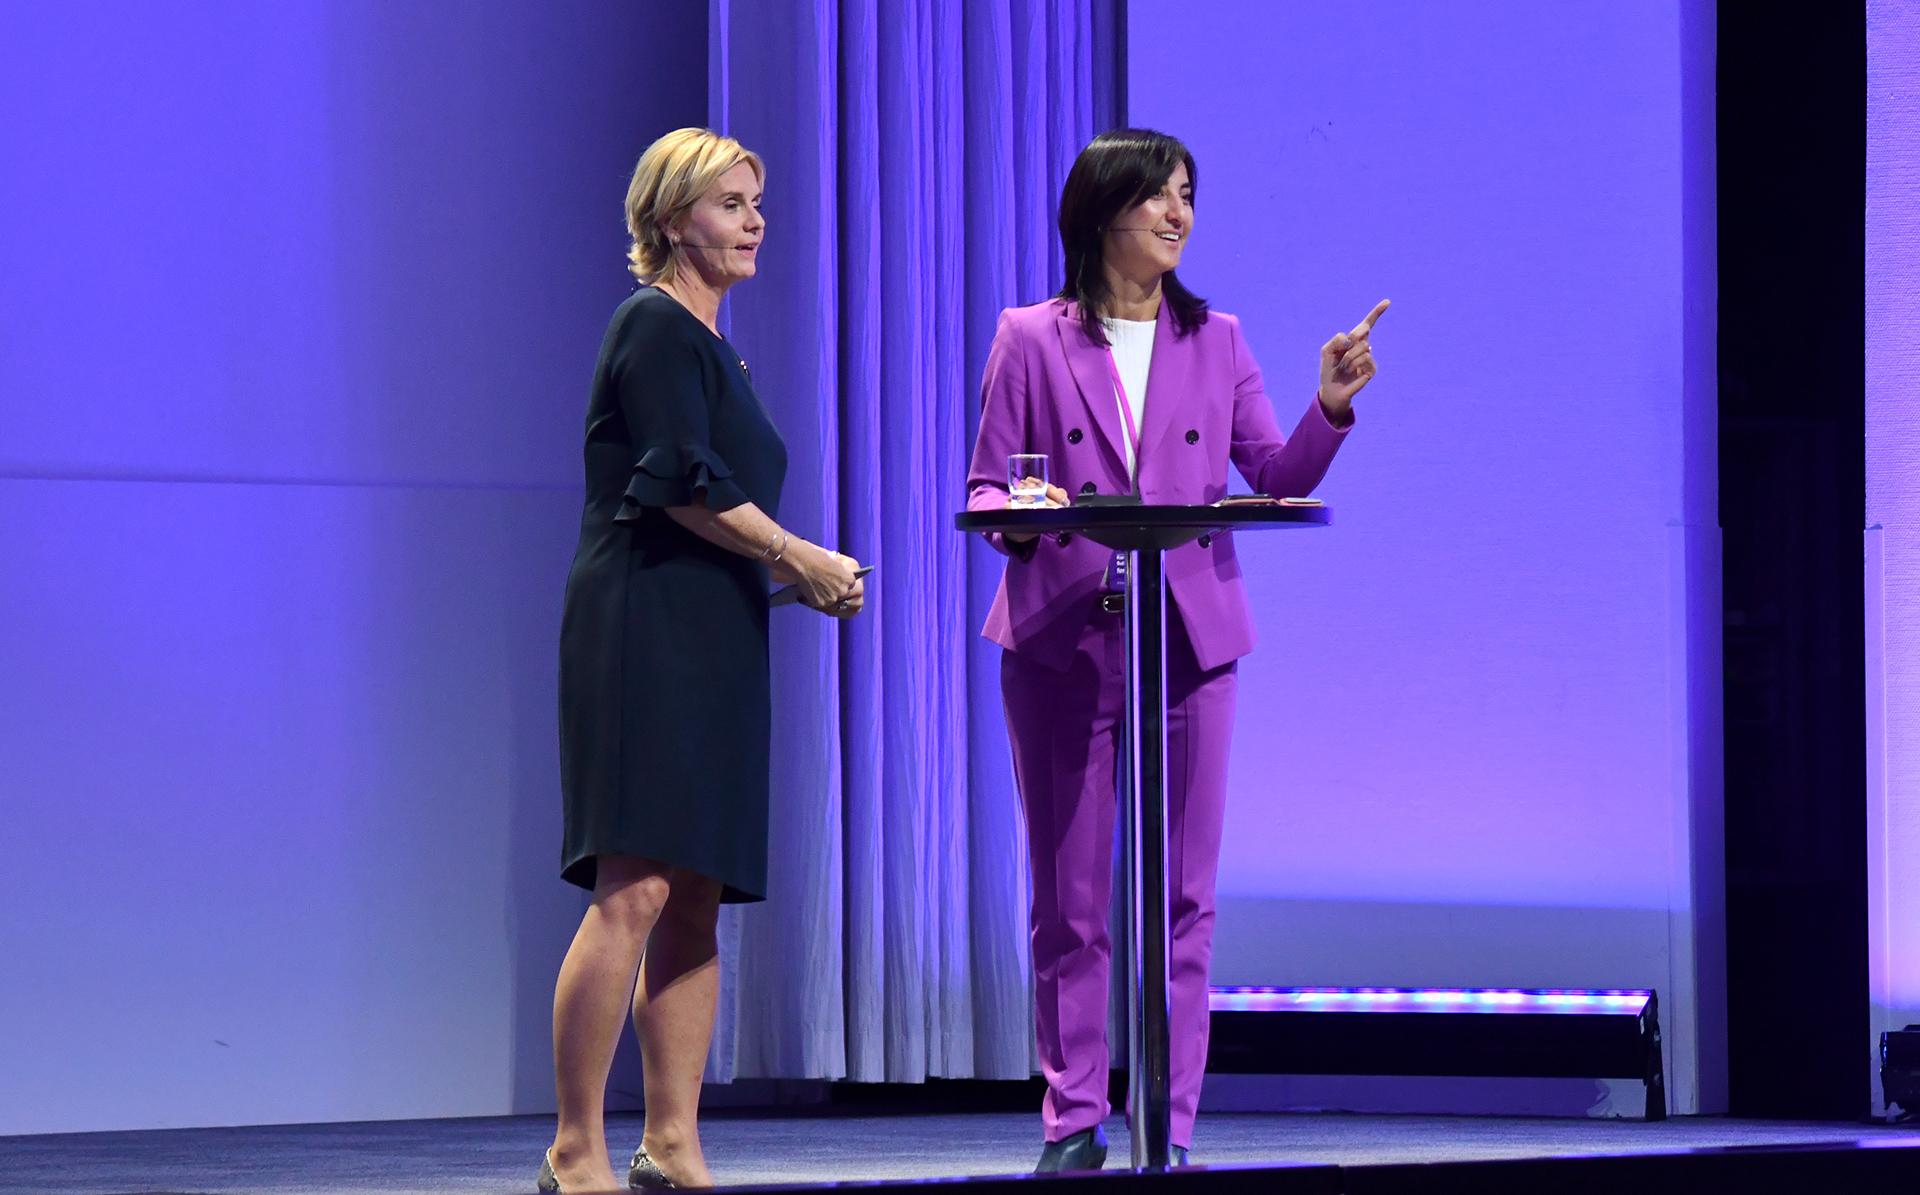 Åsa Bergman and Kamilla Sultanova